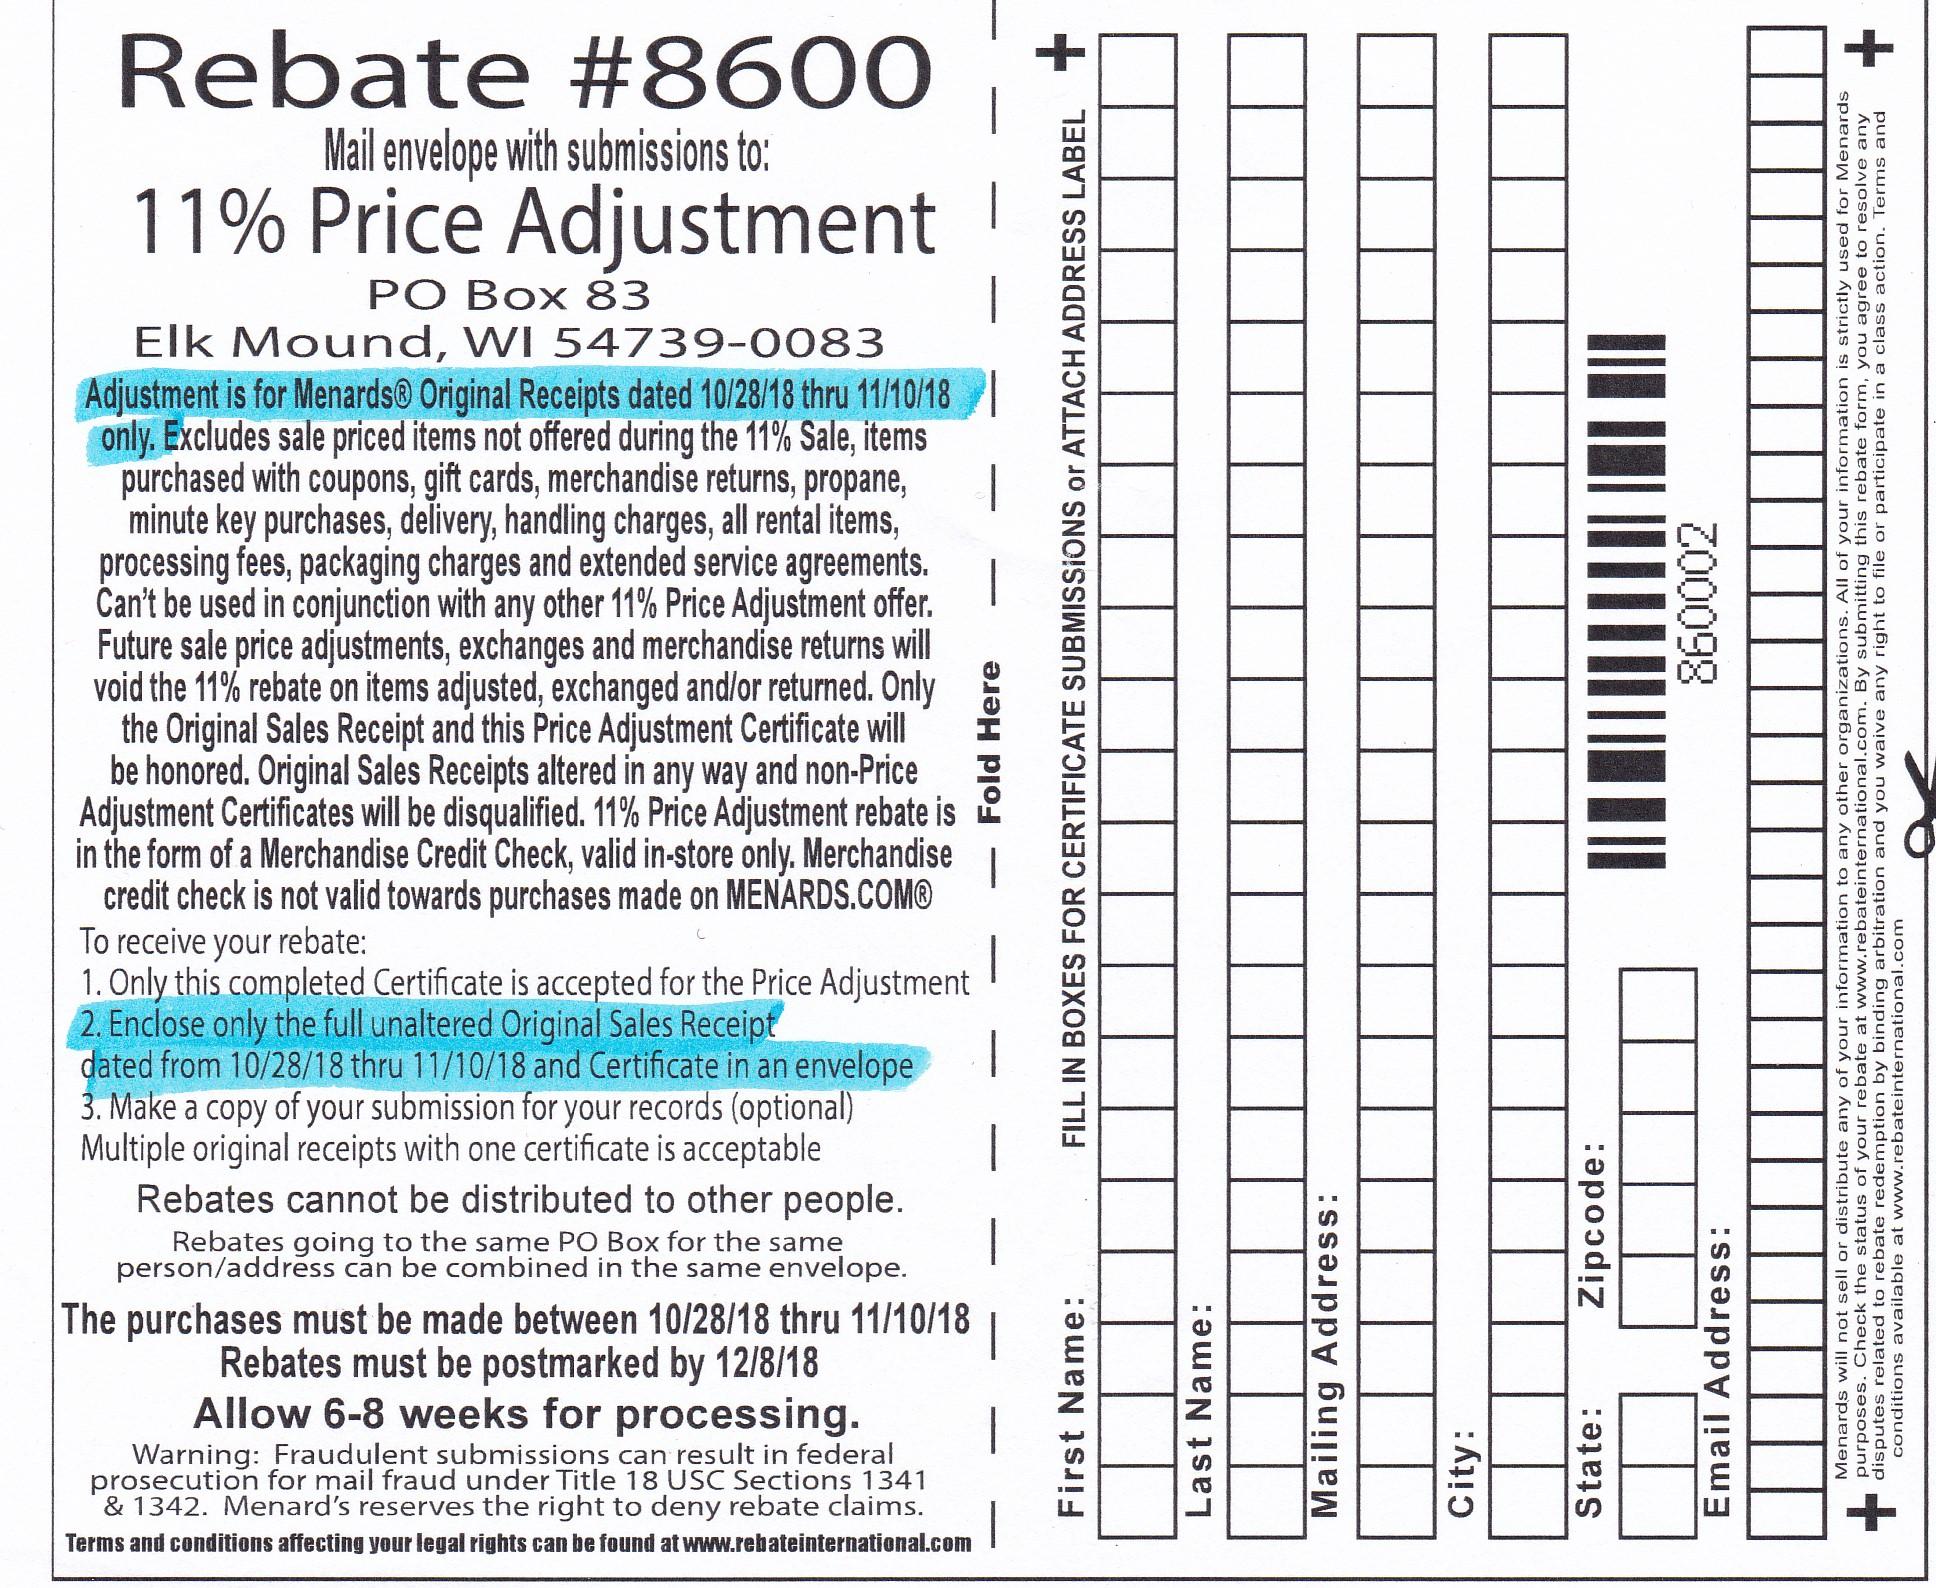 Menards 11% Price Adjustment Rebate #8600 – Purchases 10/28